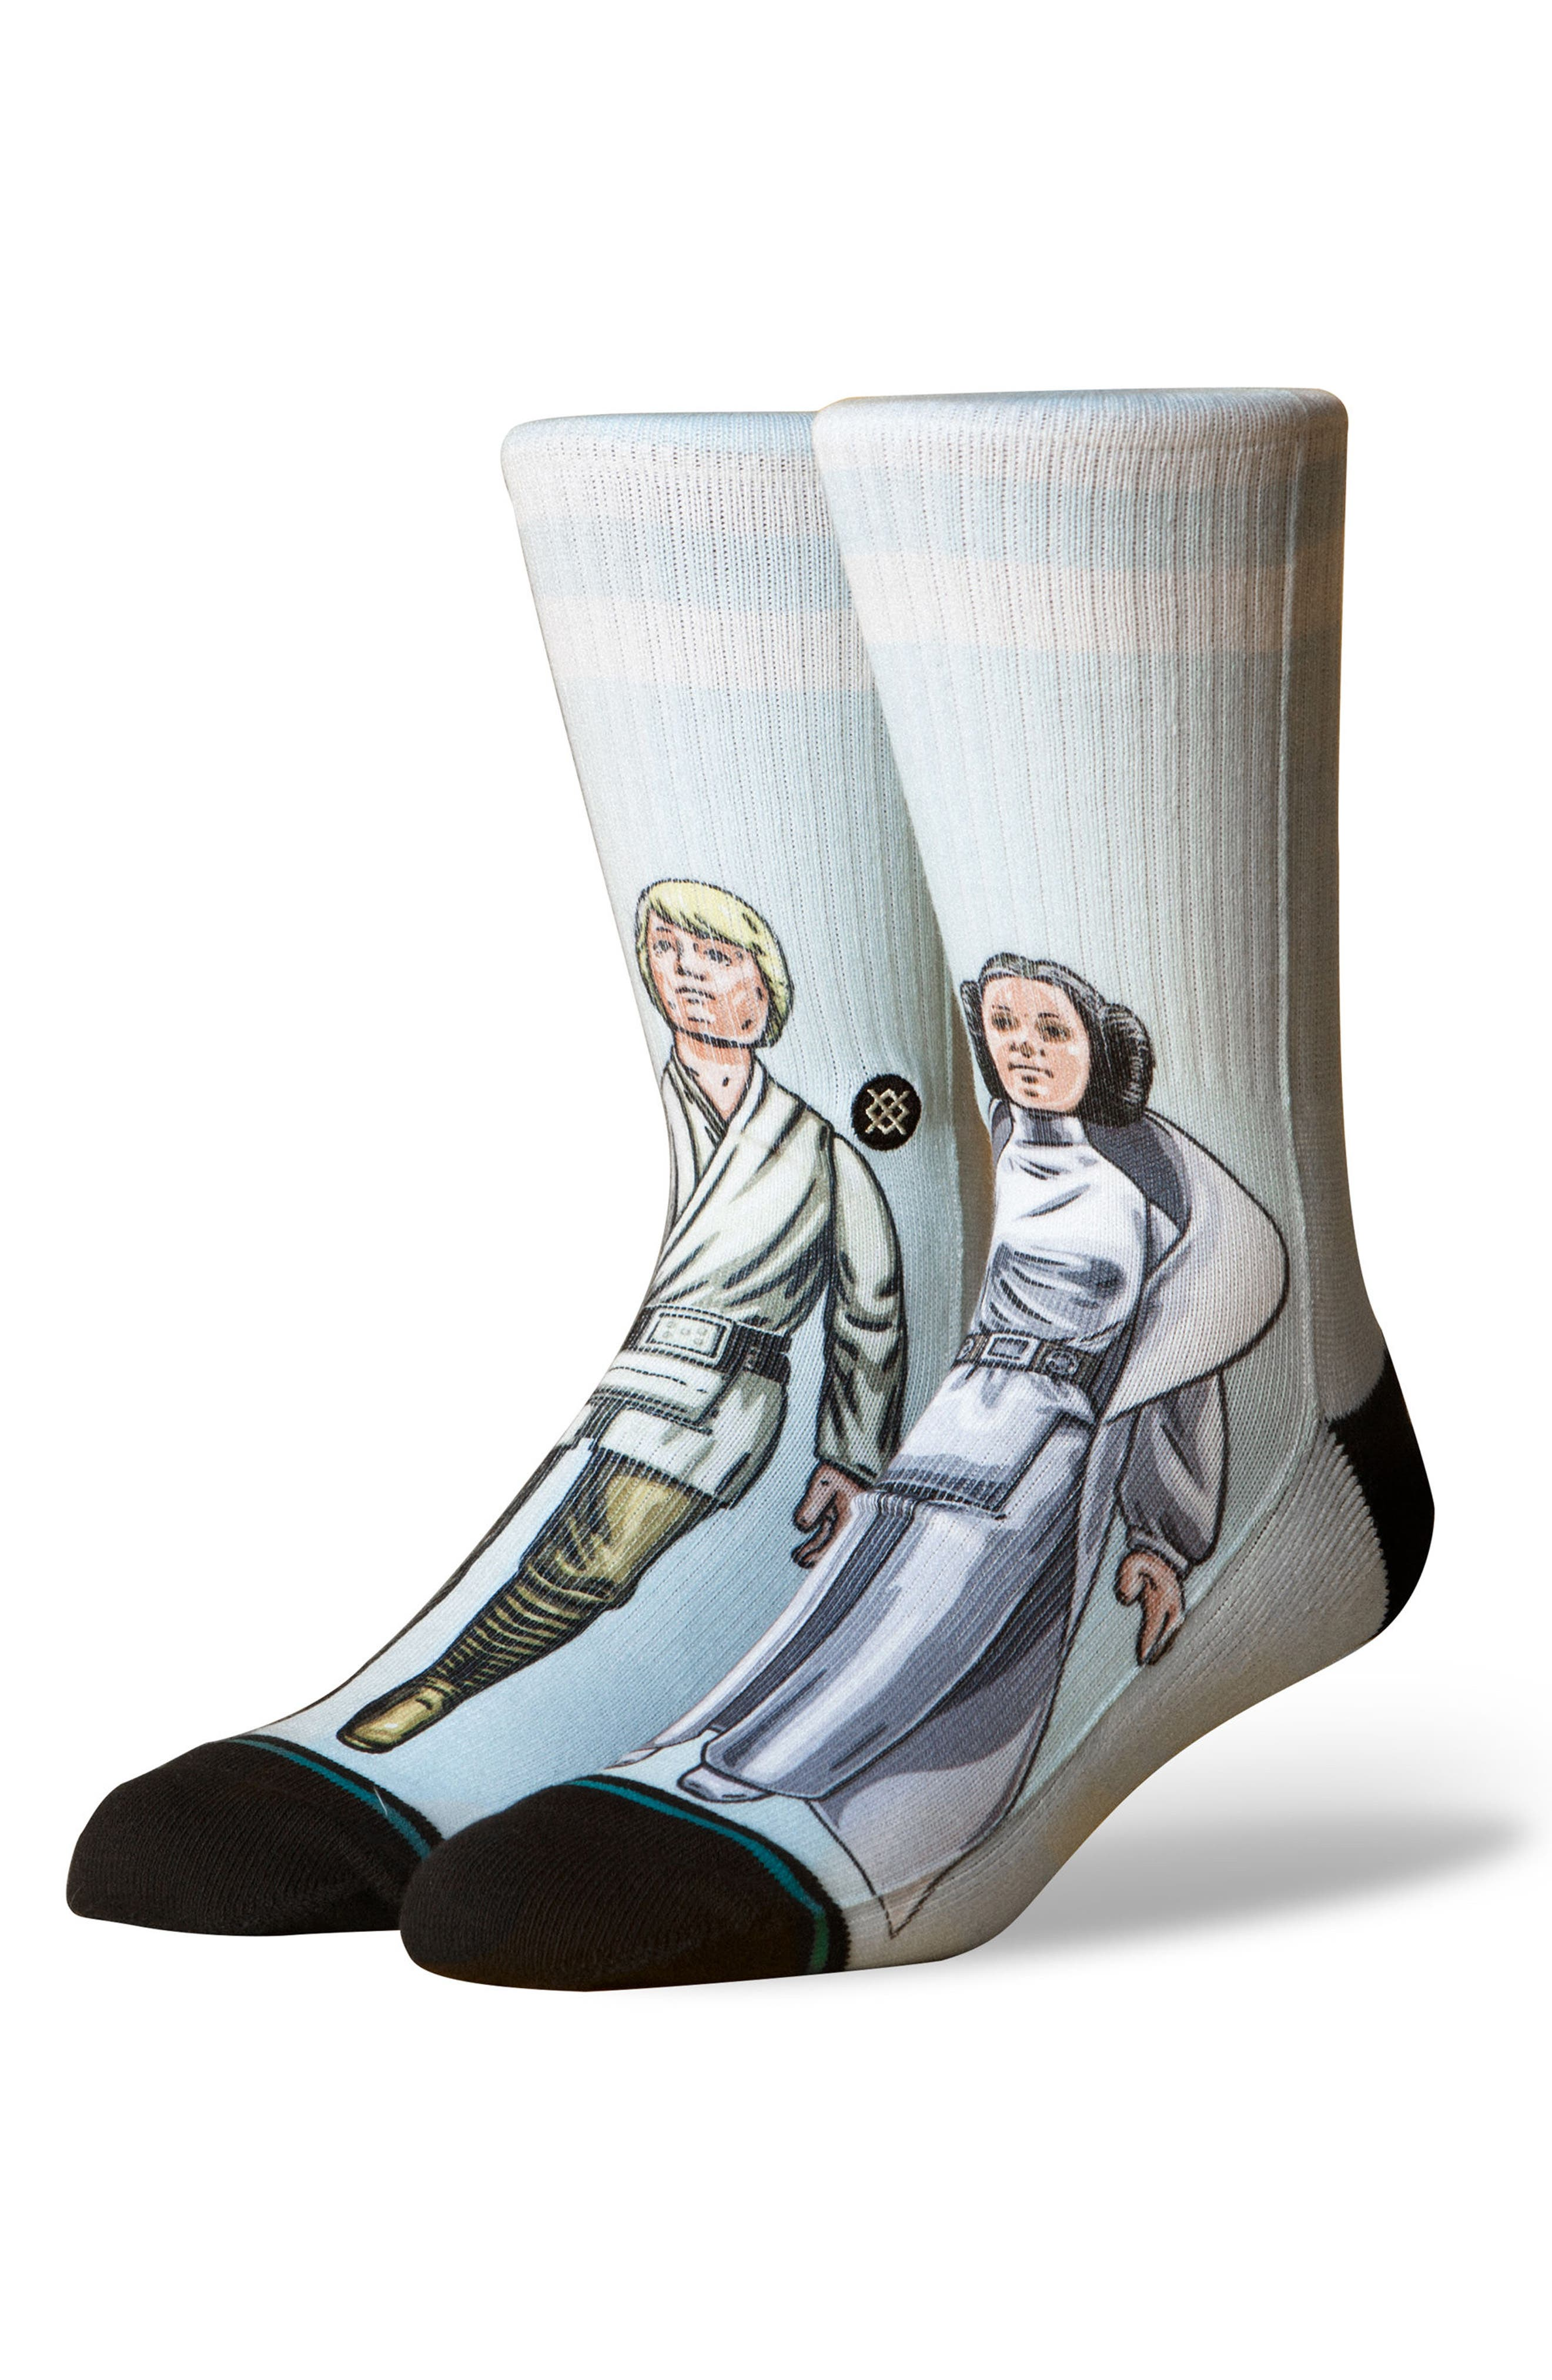 Star Wars<sup>™</sup> Family Force Socks,                             Main thumbnail 1, color,                             400